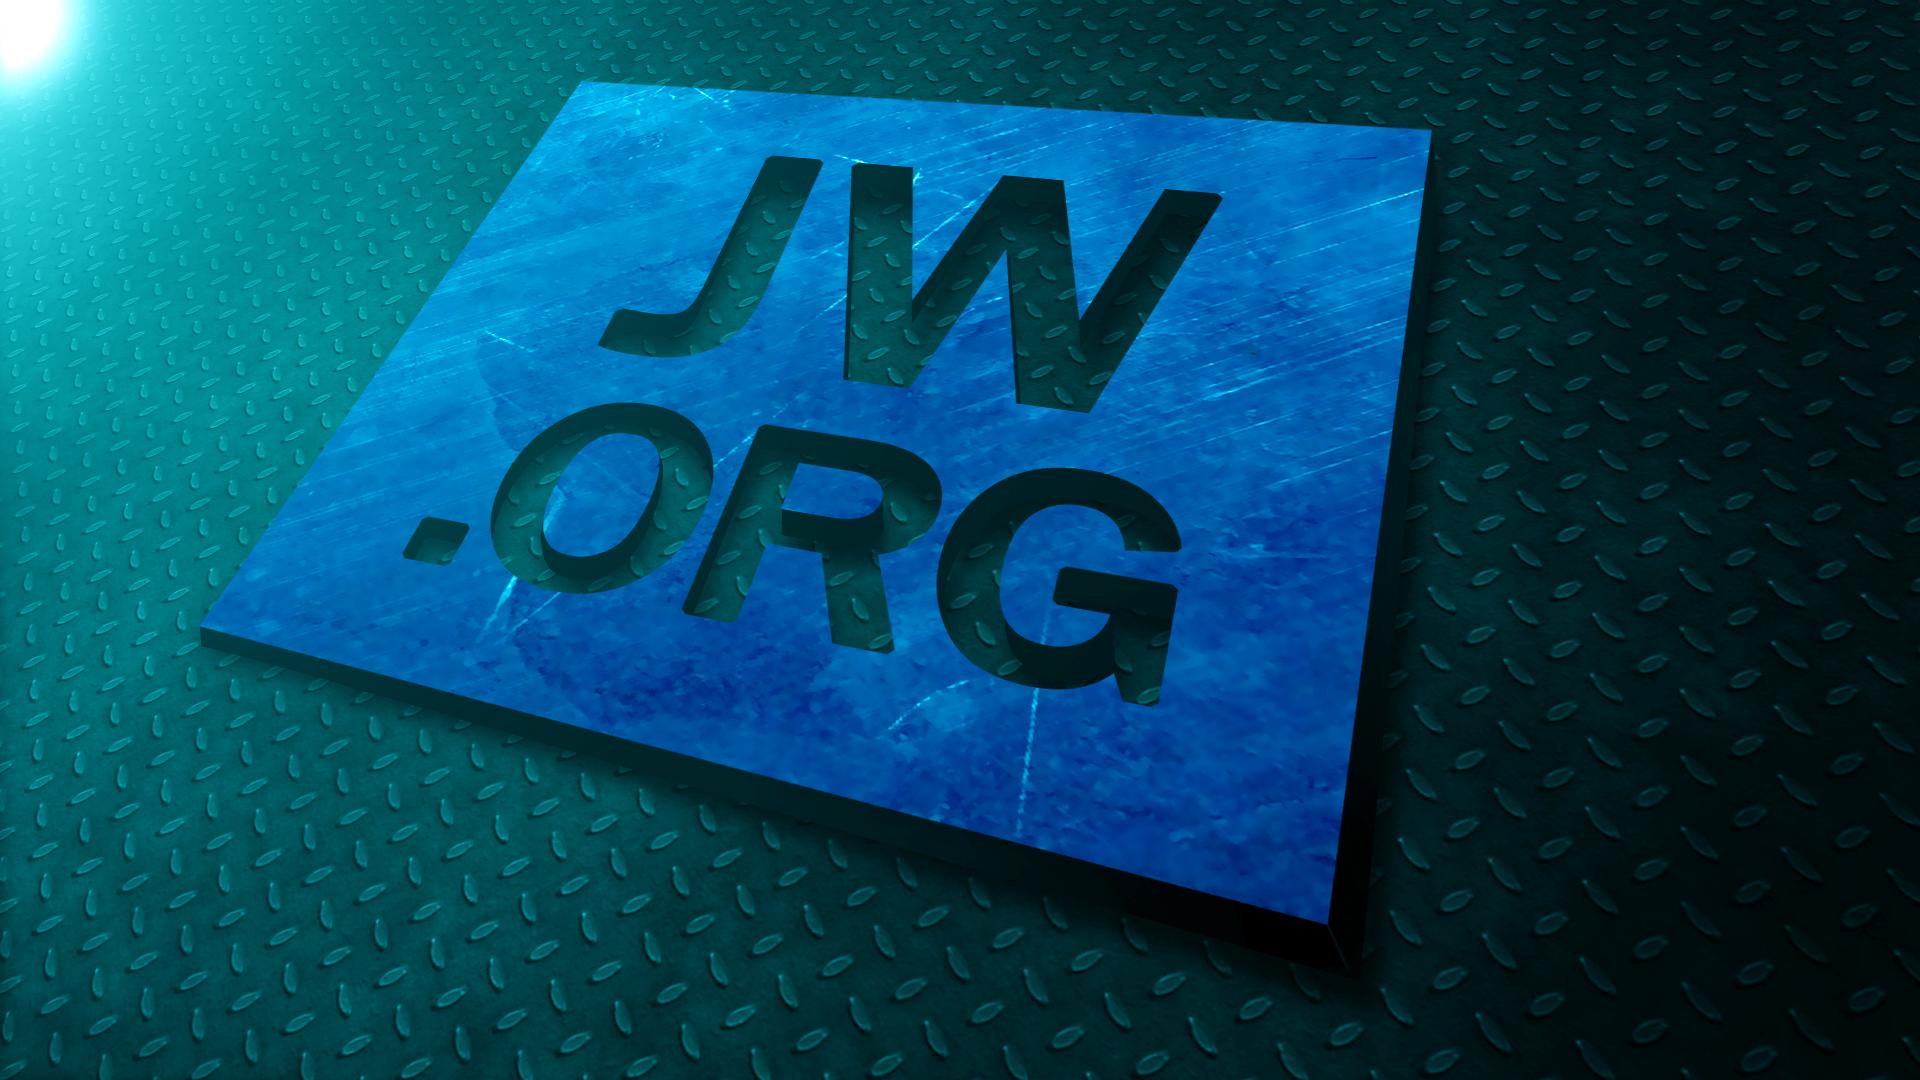 Jw org wallpaper by svsj29 on deviantart